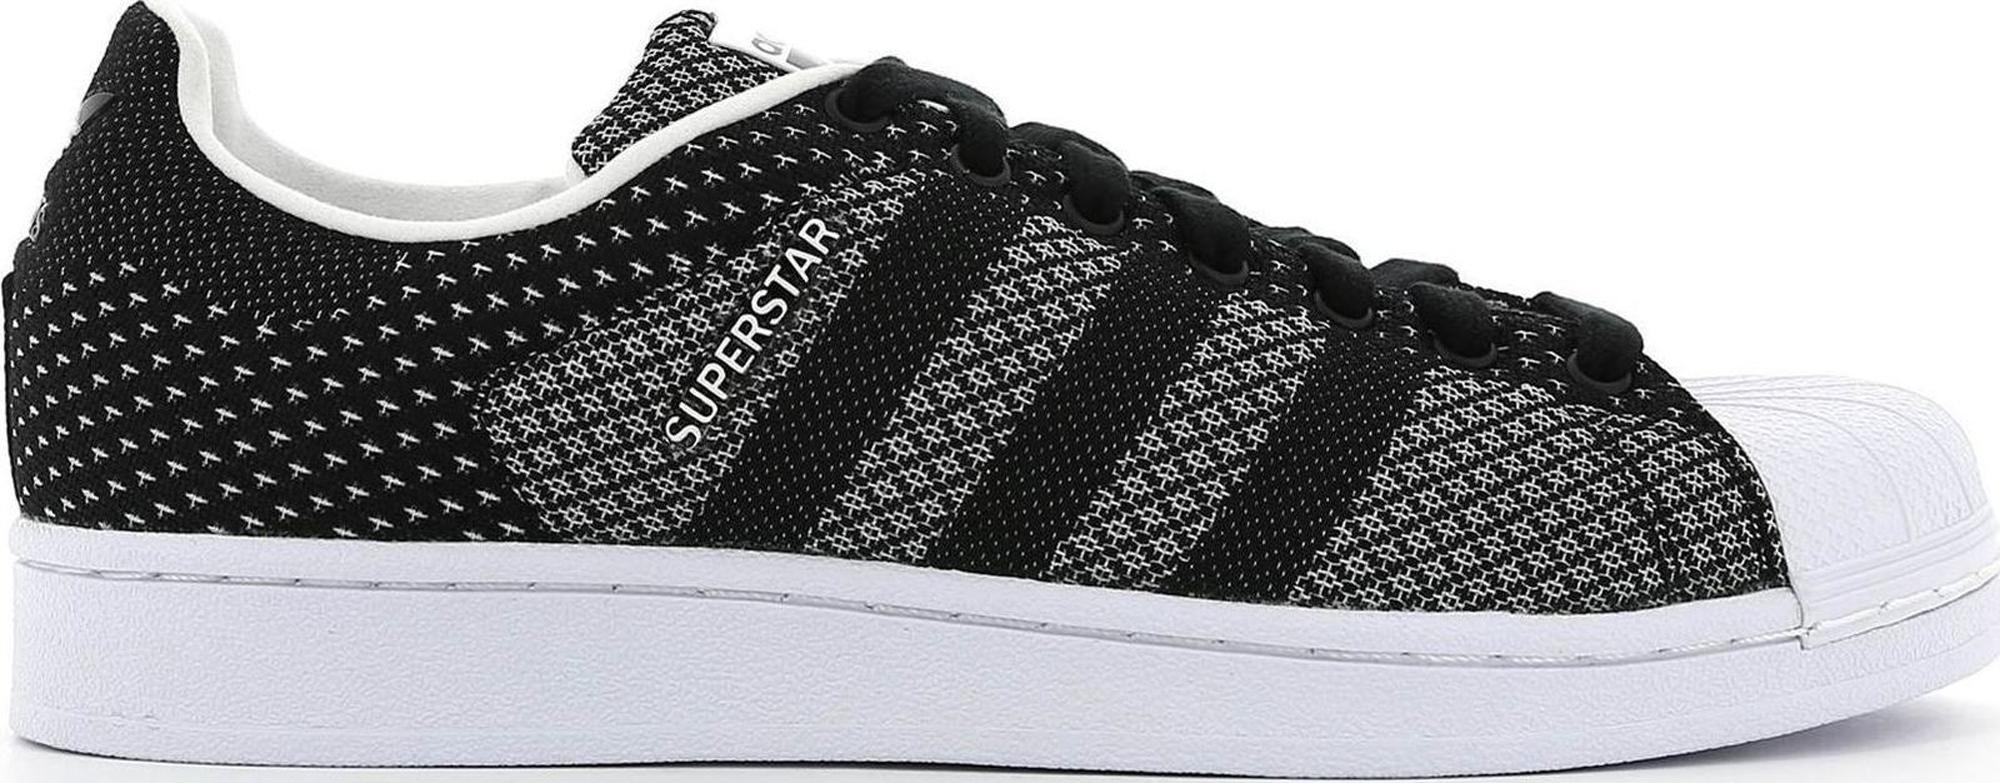 adidas Superstar Weave Black - S75177